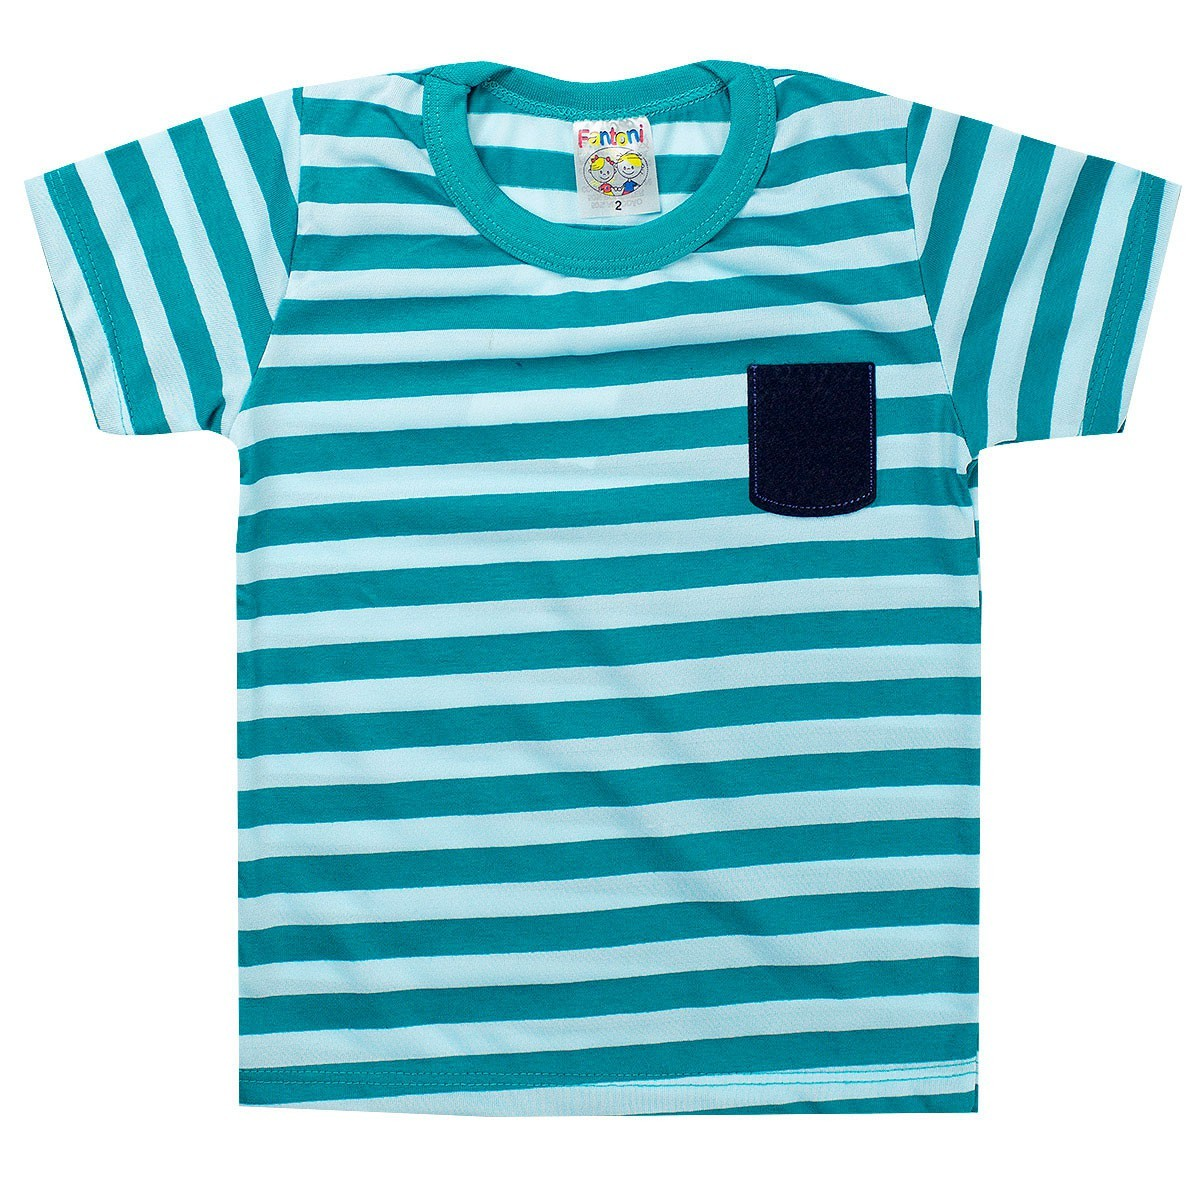 Camiseta Infantil Menino Listrada Verde - Fantoni